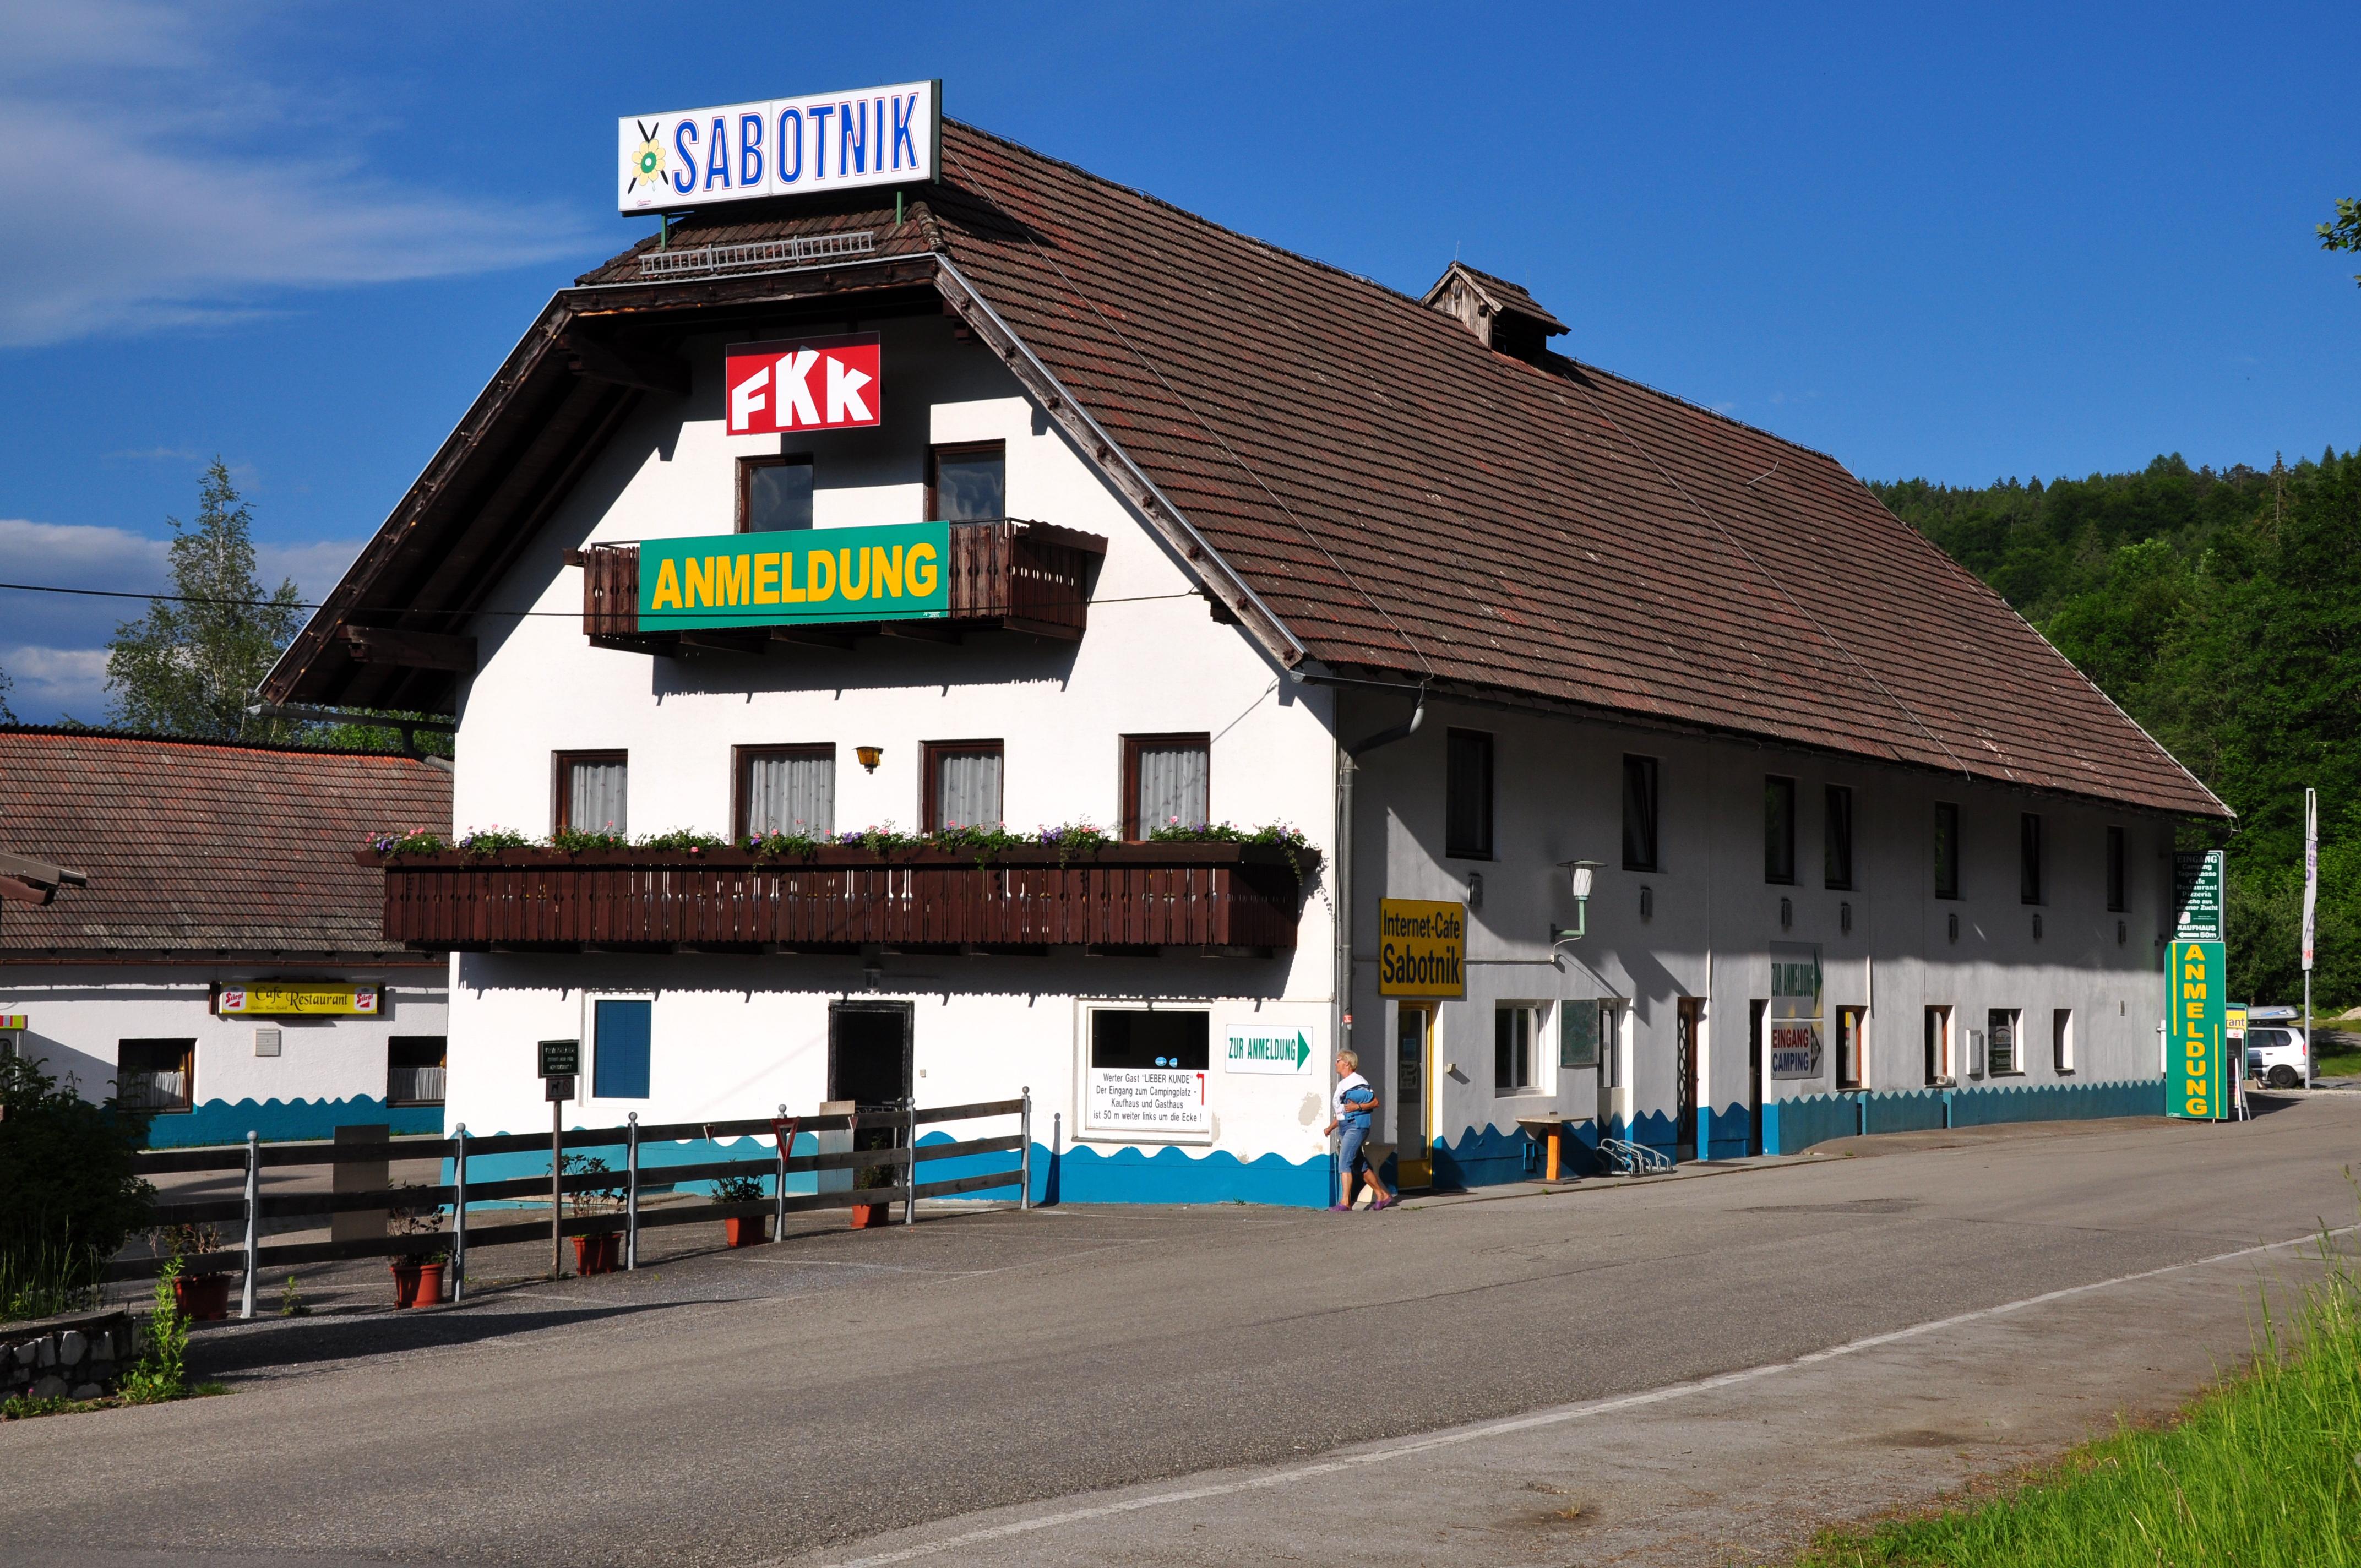 ... :Keutschach Dobein 9 vulgo SABOTNIK Hube FKK-Camping 30052010 03.jpg